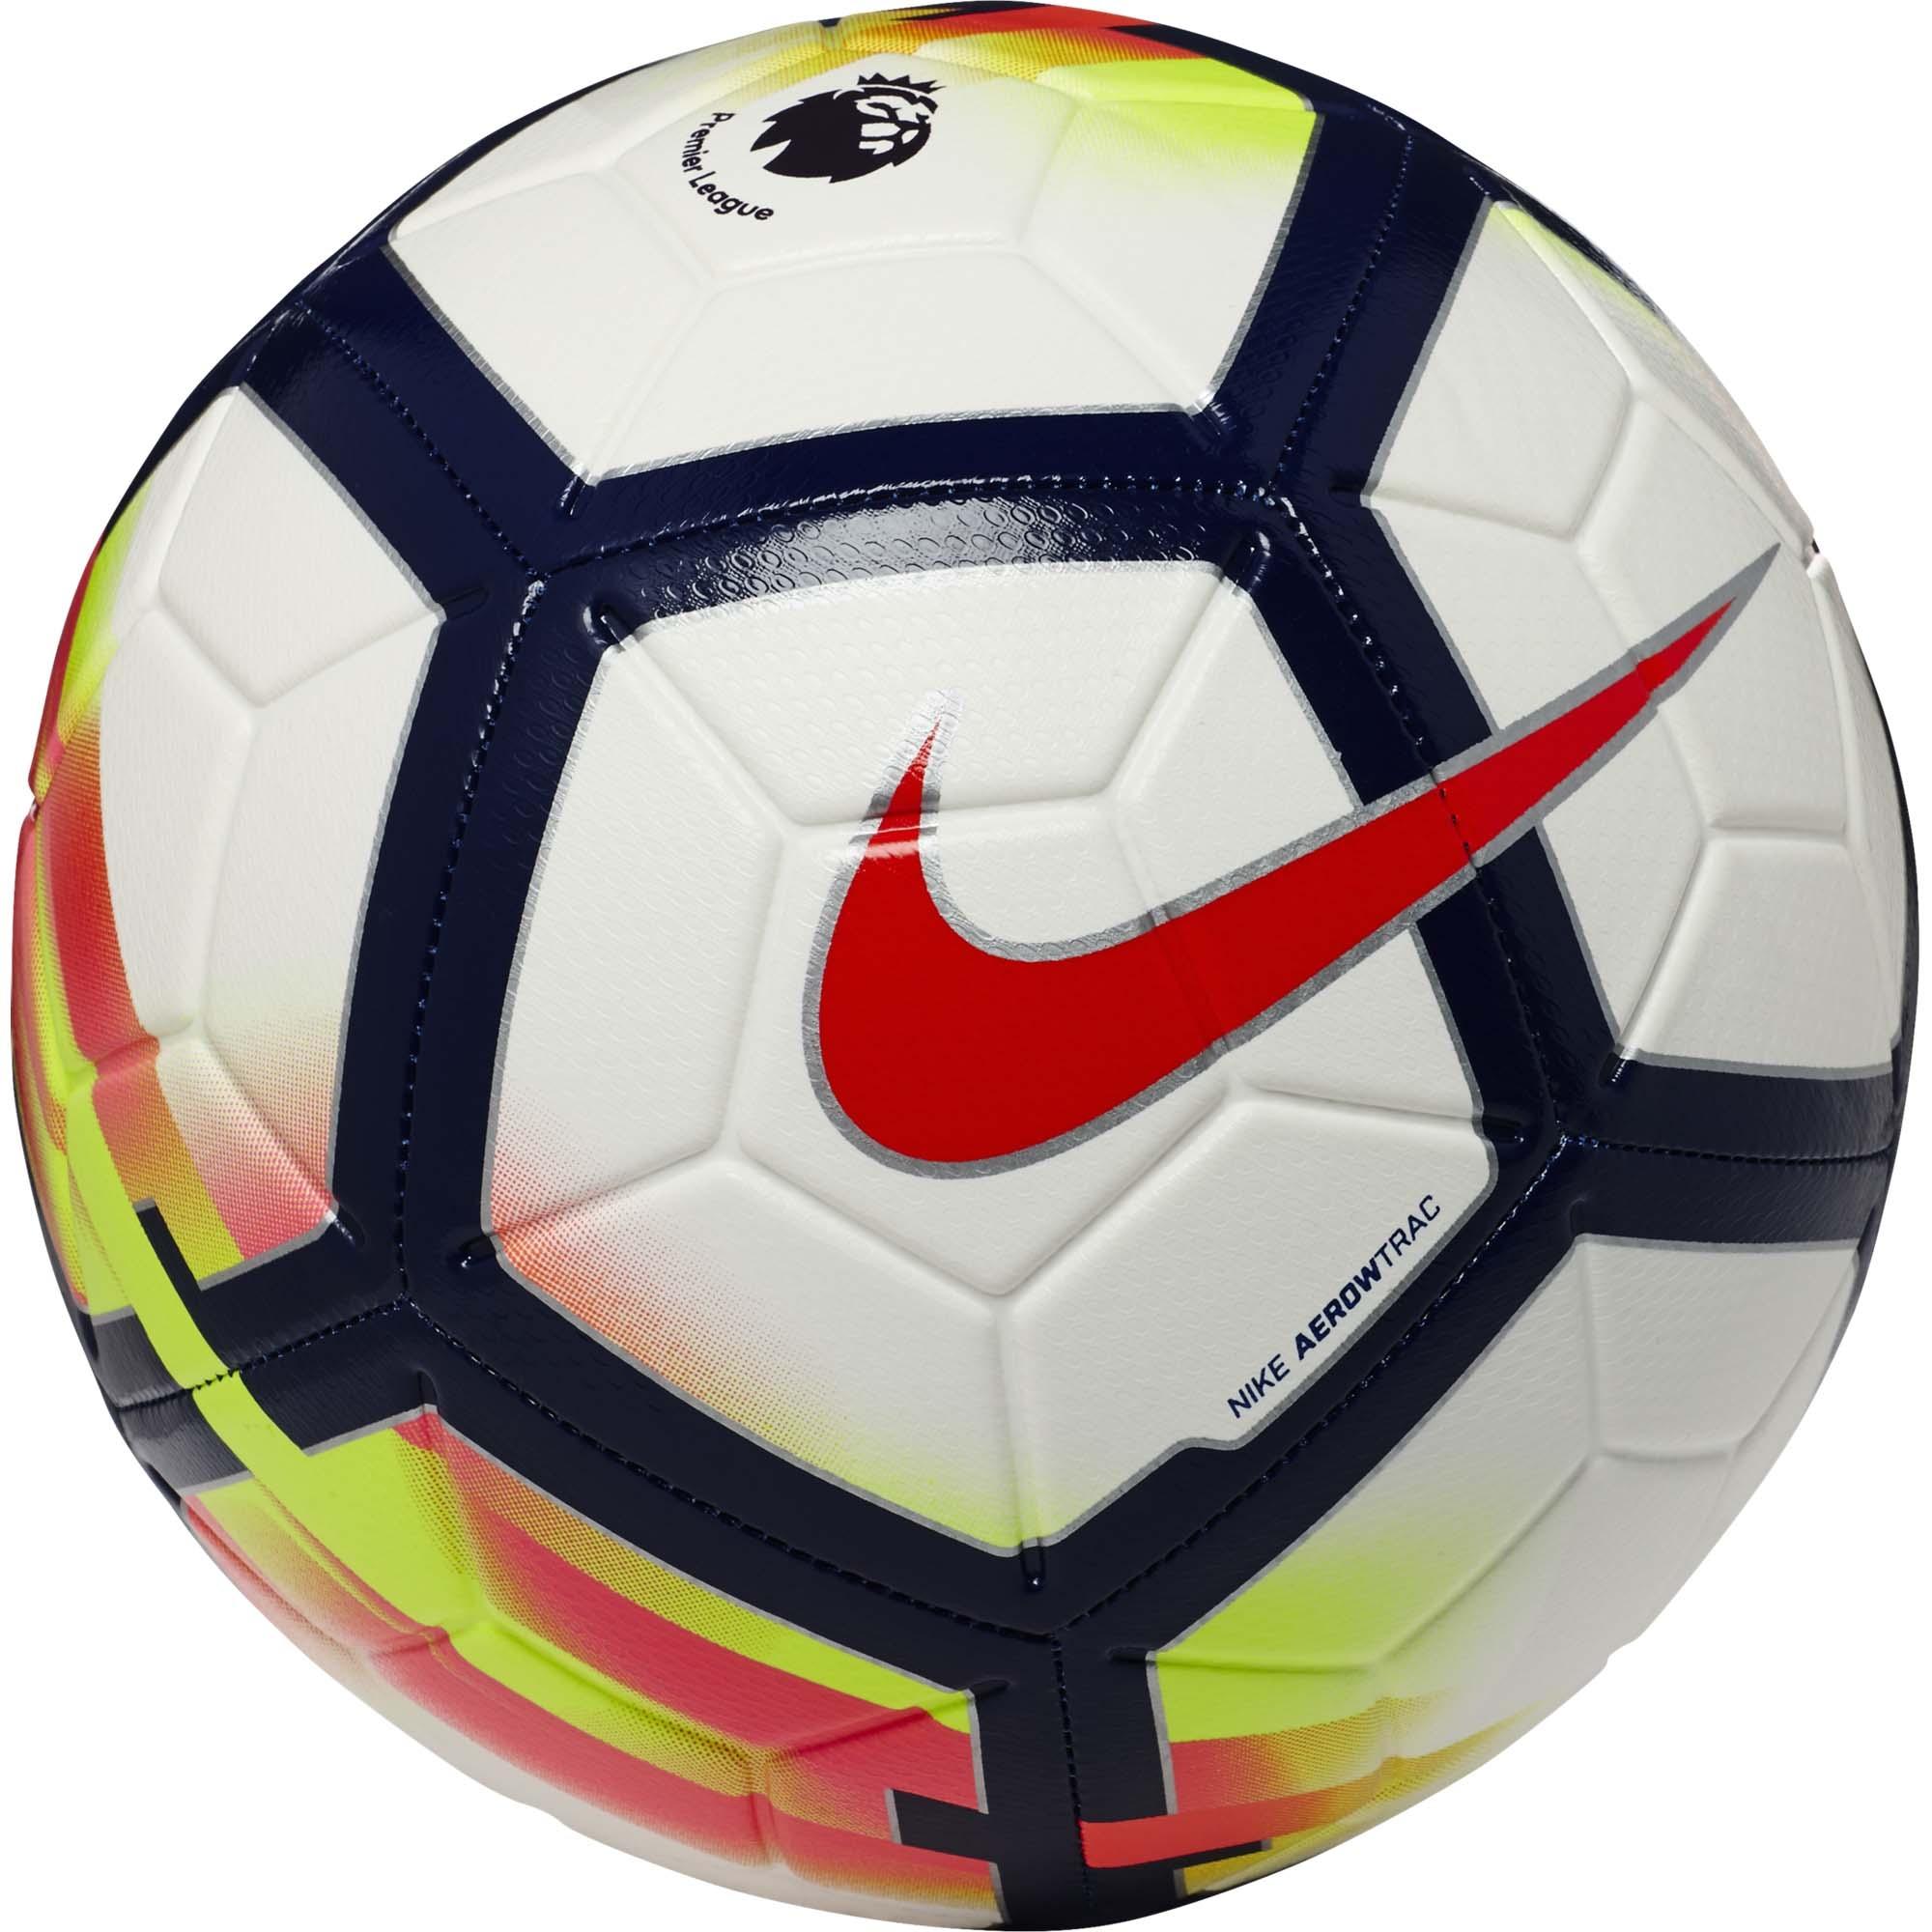 b49b4e4ab671f NIKE BALÓN STRIKE PREMIER LEAGUE 2017 2018 SC3148-100 - Deportes Liverpool